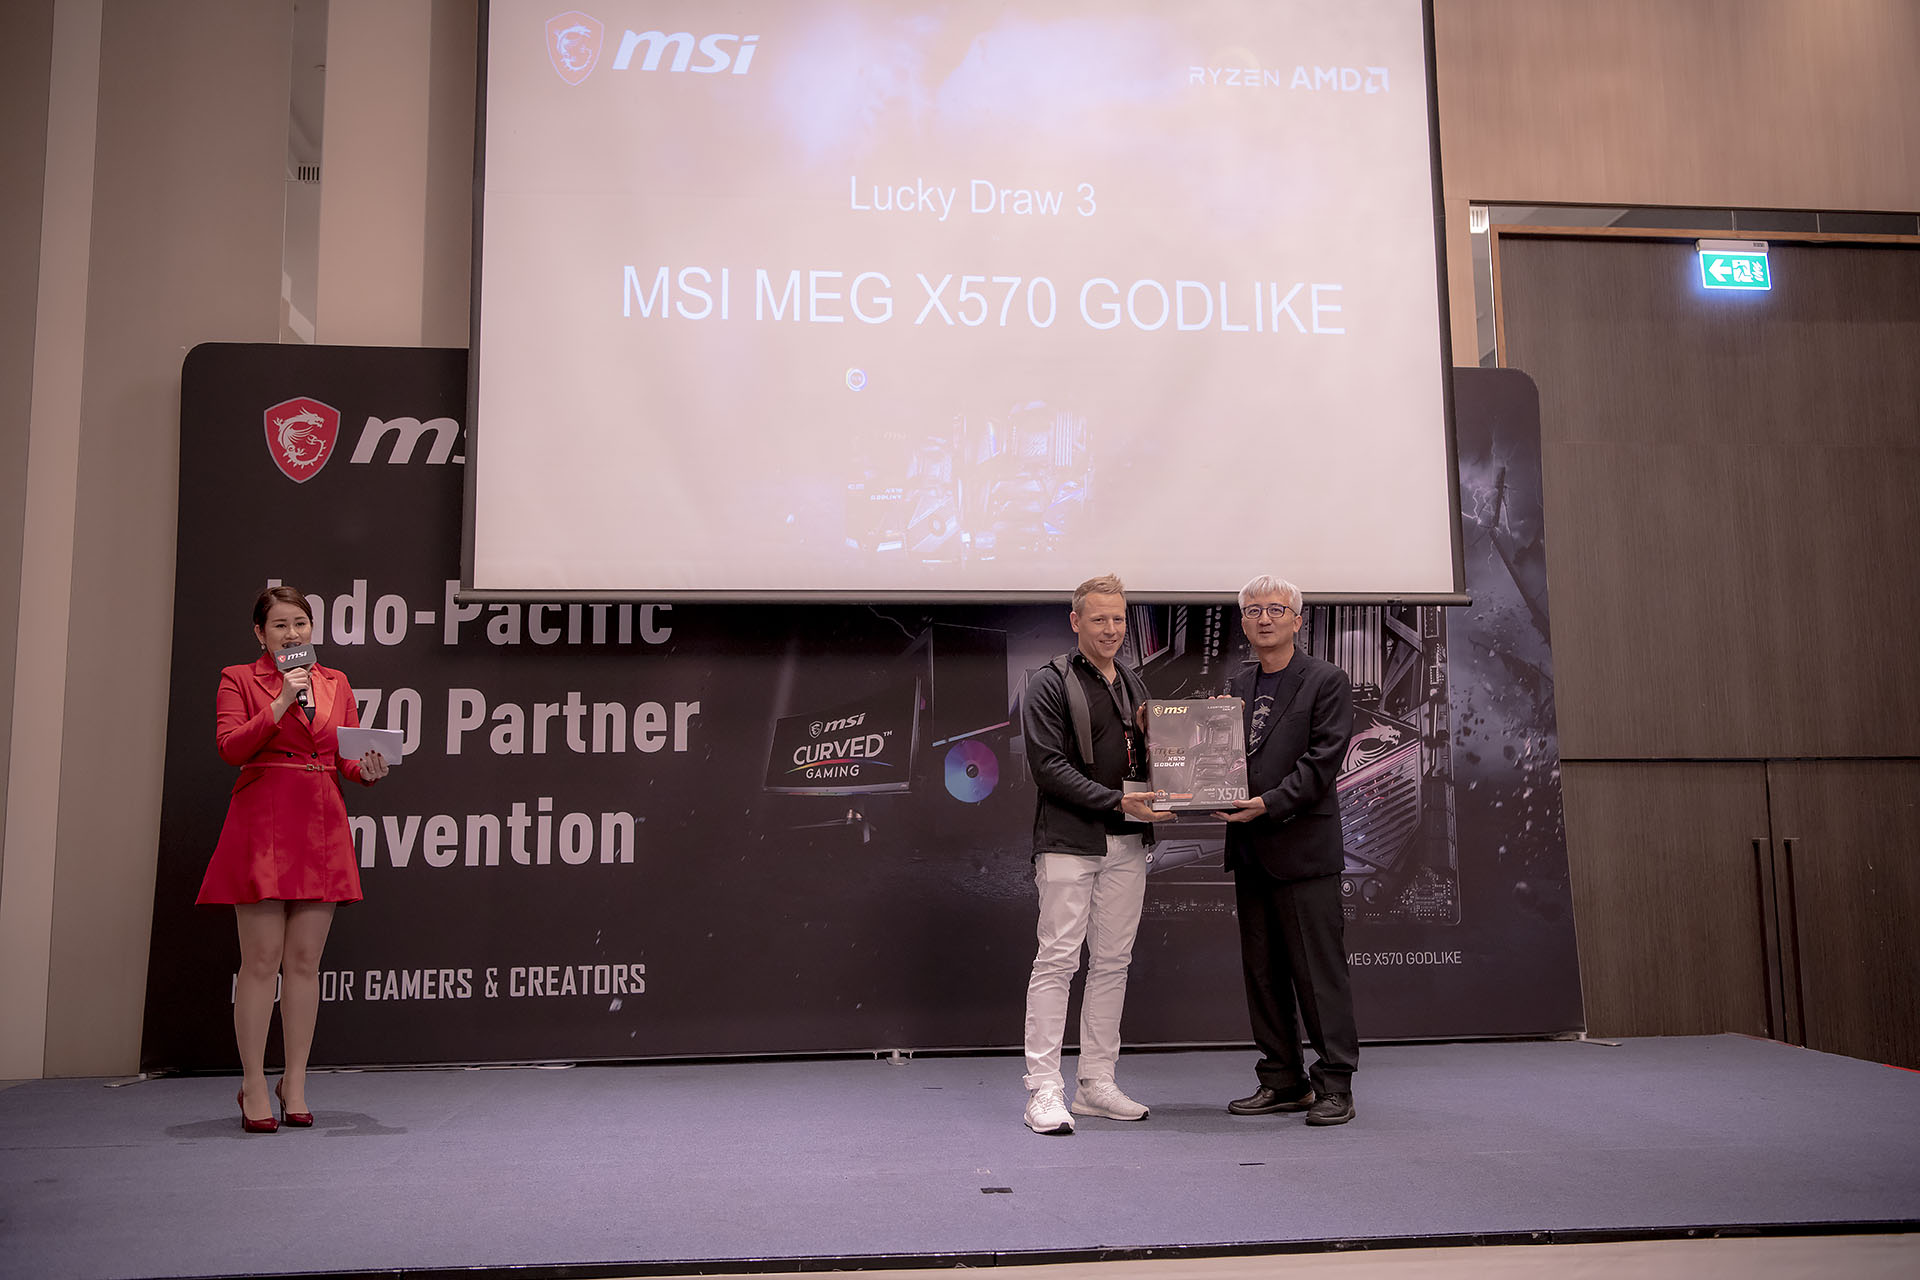 dsc 4970 บรรยากาศงาน MSI Indo Pacific X570 Partner Convention พบการเปิดตัวเมนบอร์ด X570 รุ่นใหม่ล่าสุดจากทาง MSI ต้อนรับการมาของซีพียู AMD RYZEN 3000ซีรี่ย์